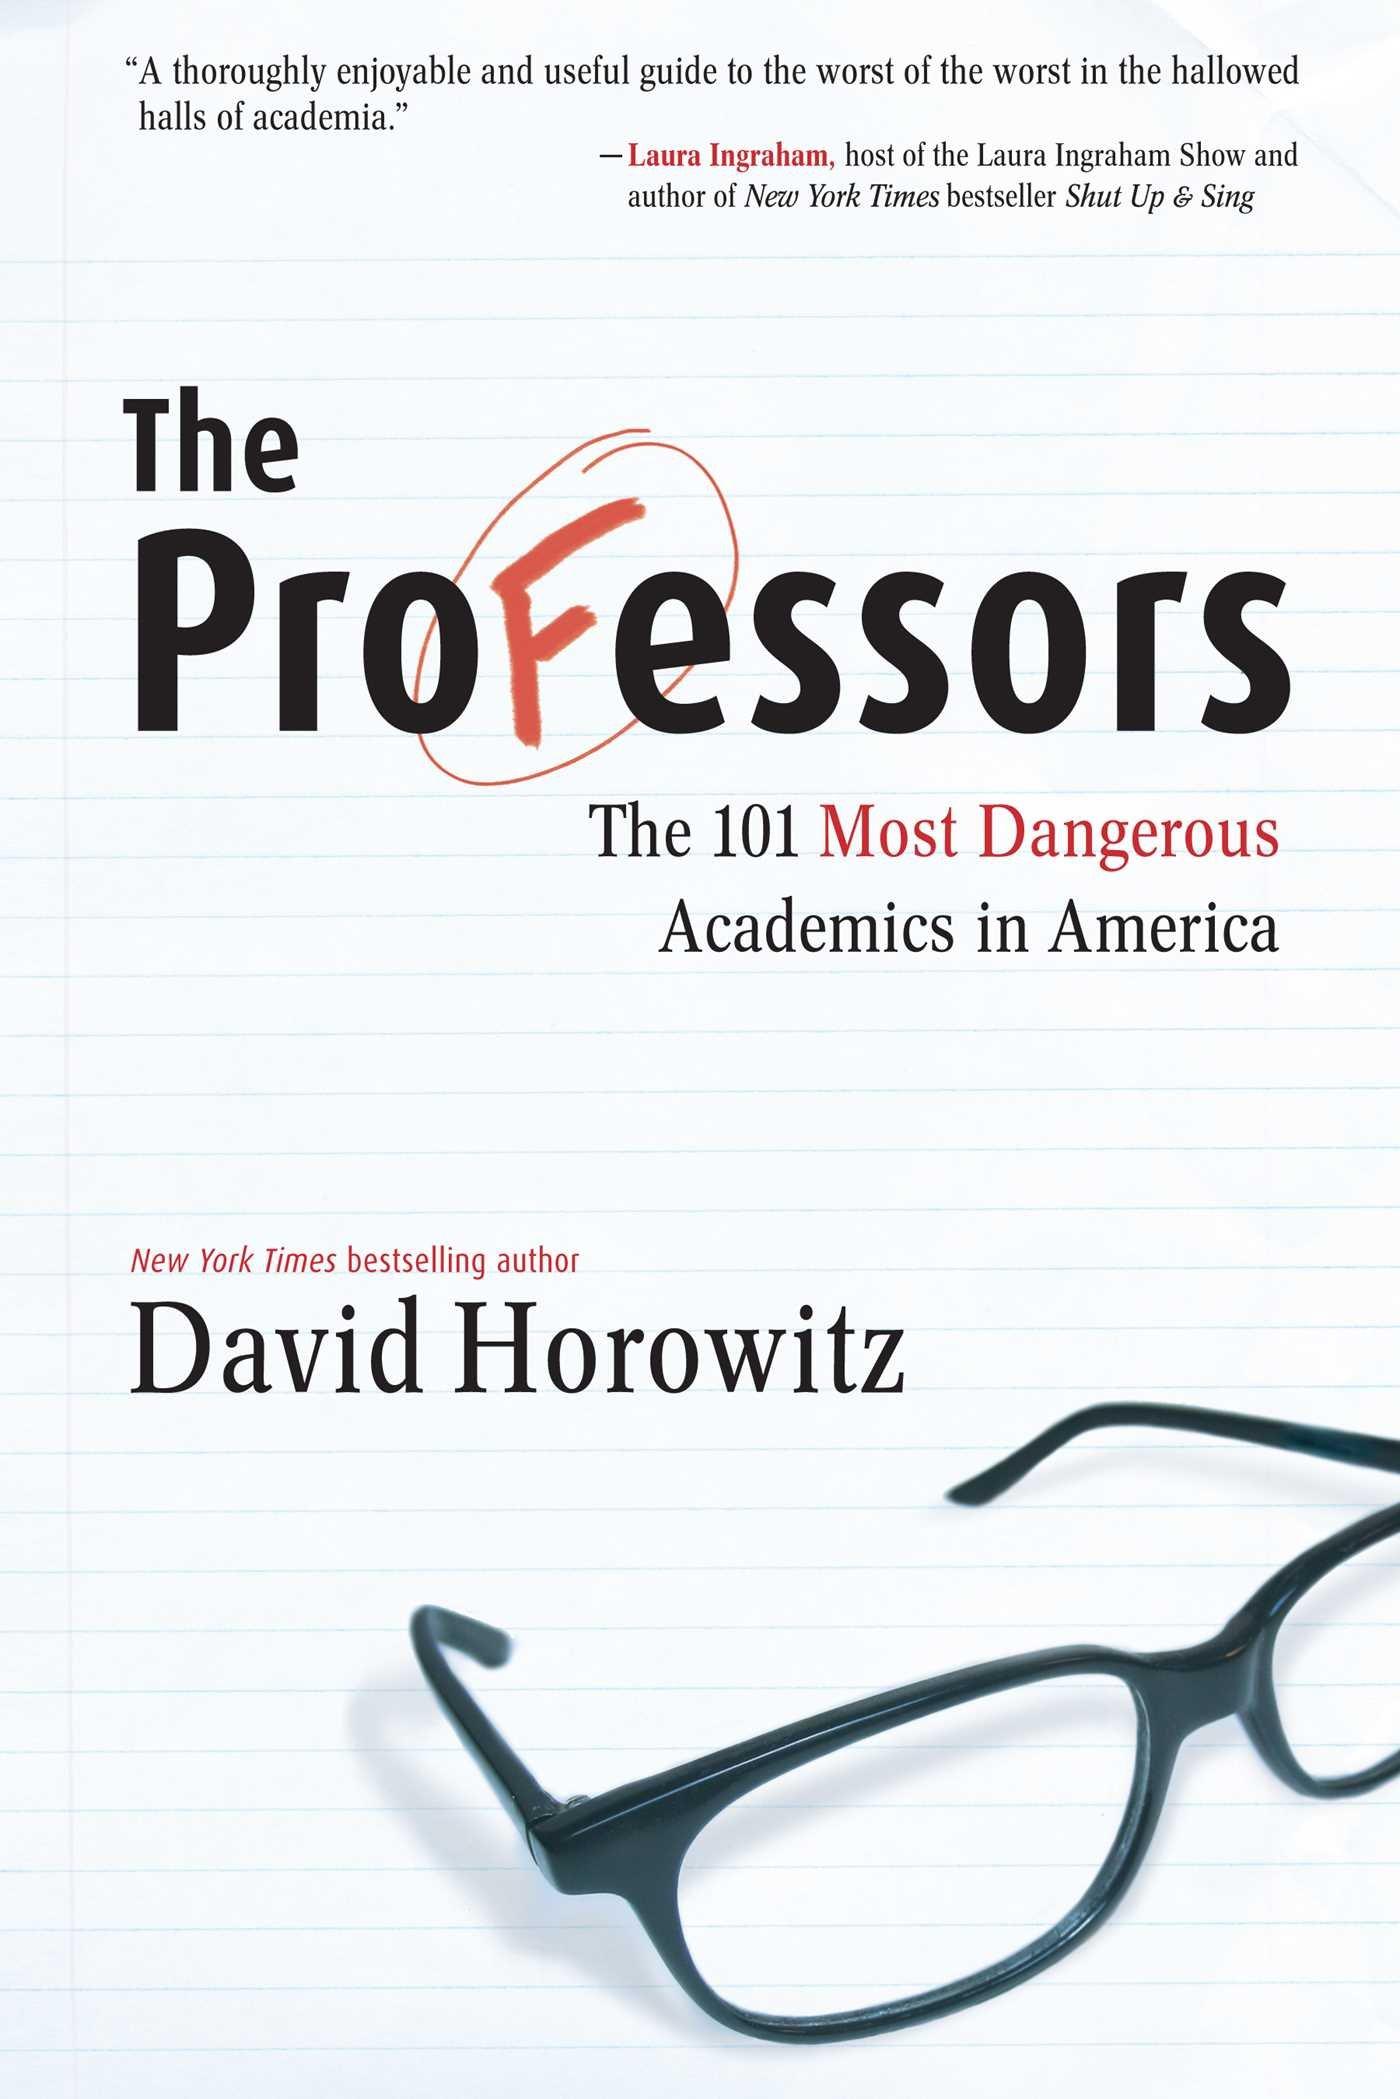 The Professors: The 101 Most Dangerous Academics in America: David  Horowitz: 9781596985254: Amazon.com: Books